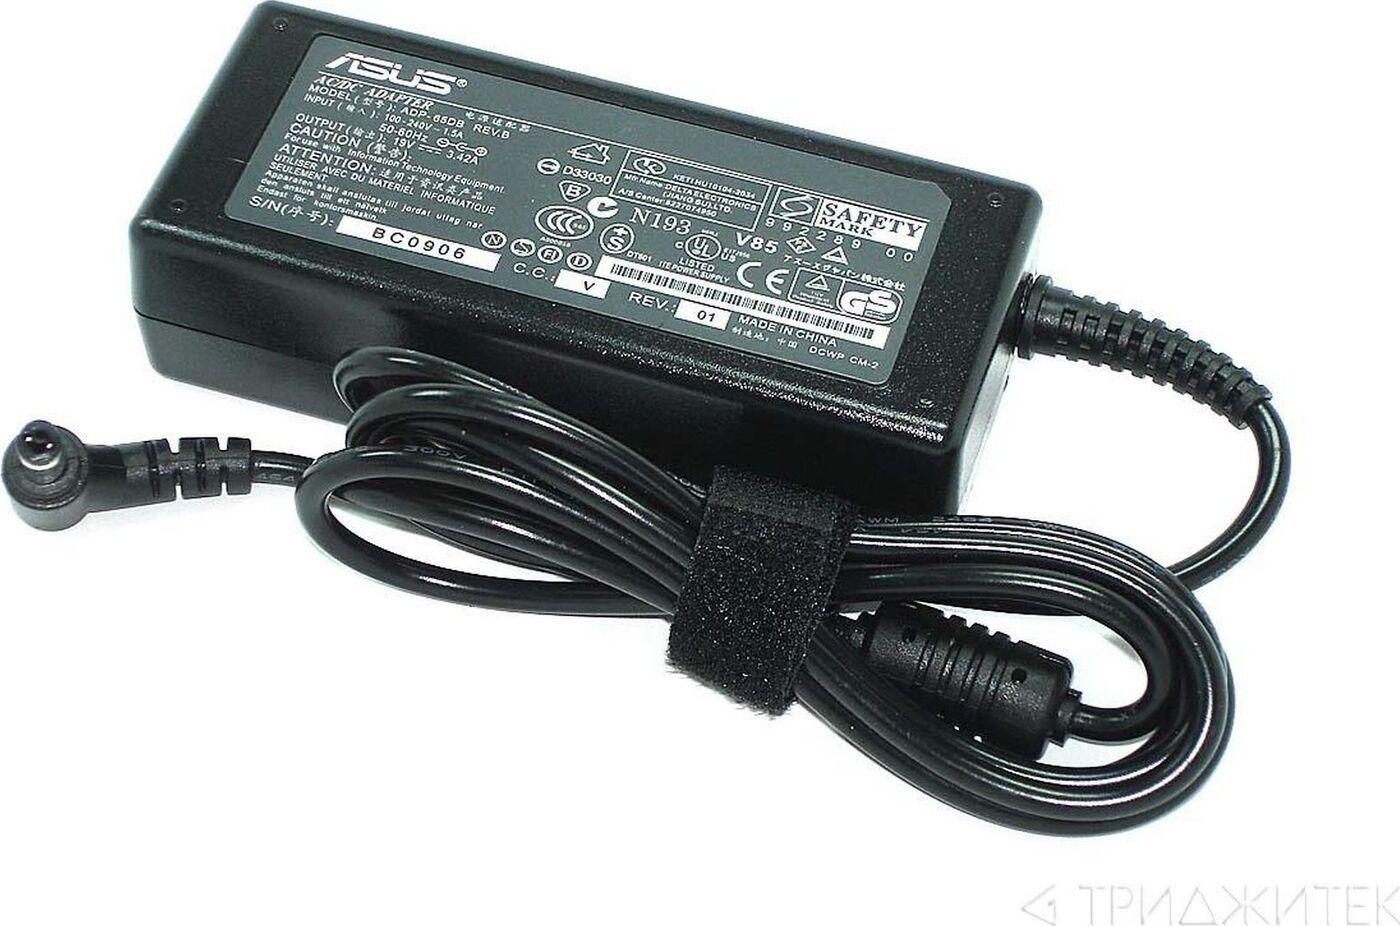 Блок питания Pitatel AD-243 для Asus (19.5V 3.42A) адаптер питания для ноутбука pitatel ad 002